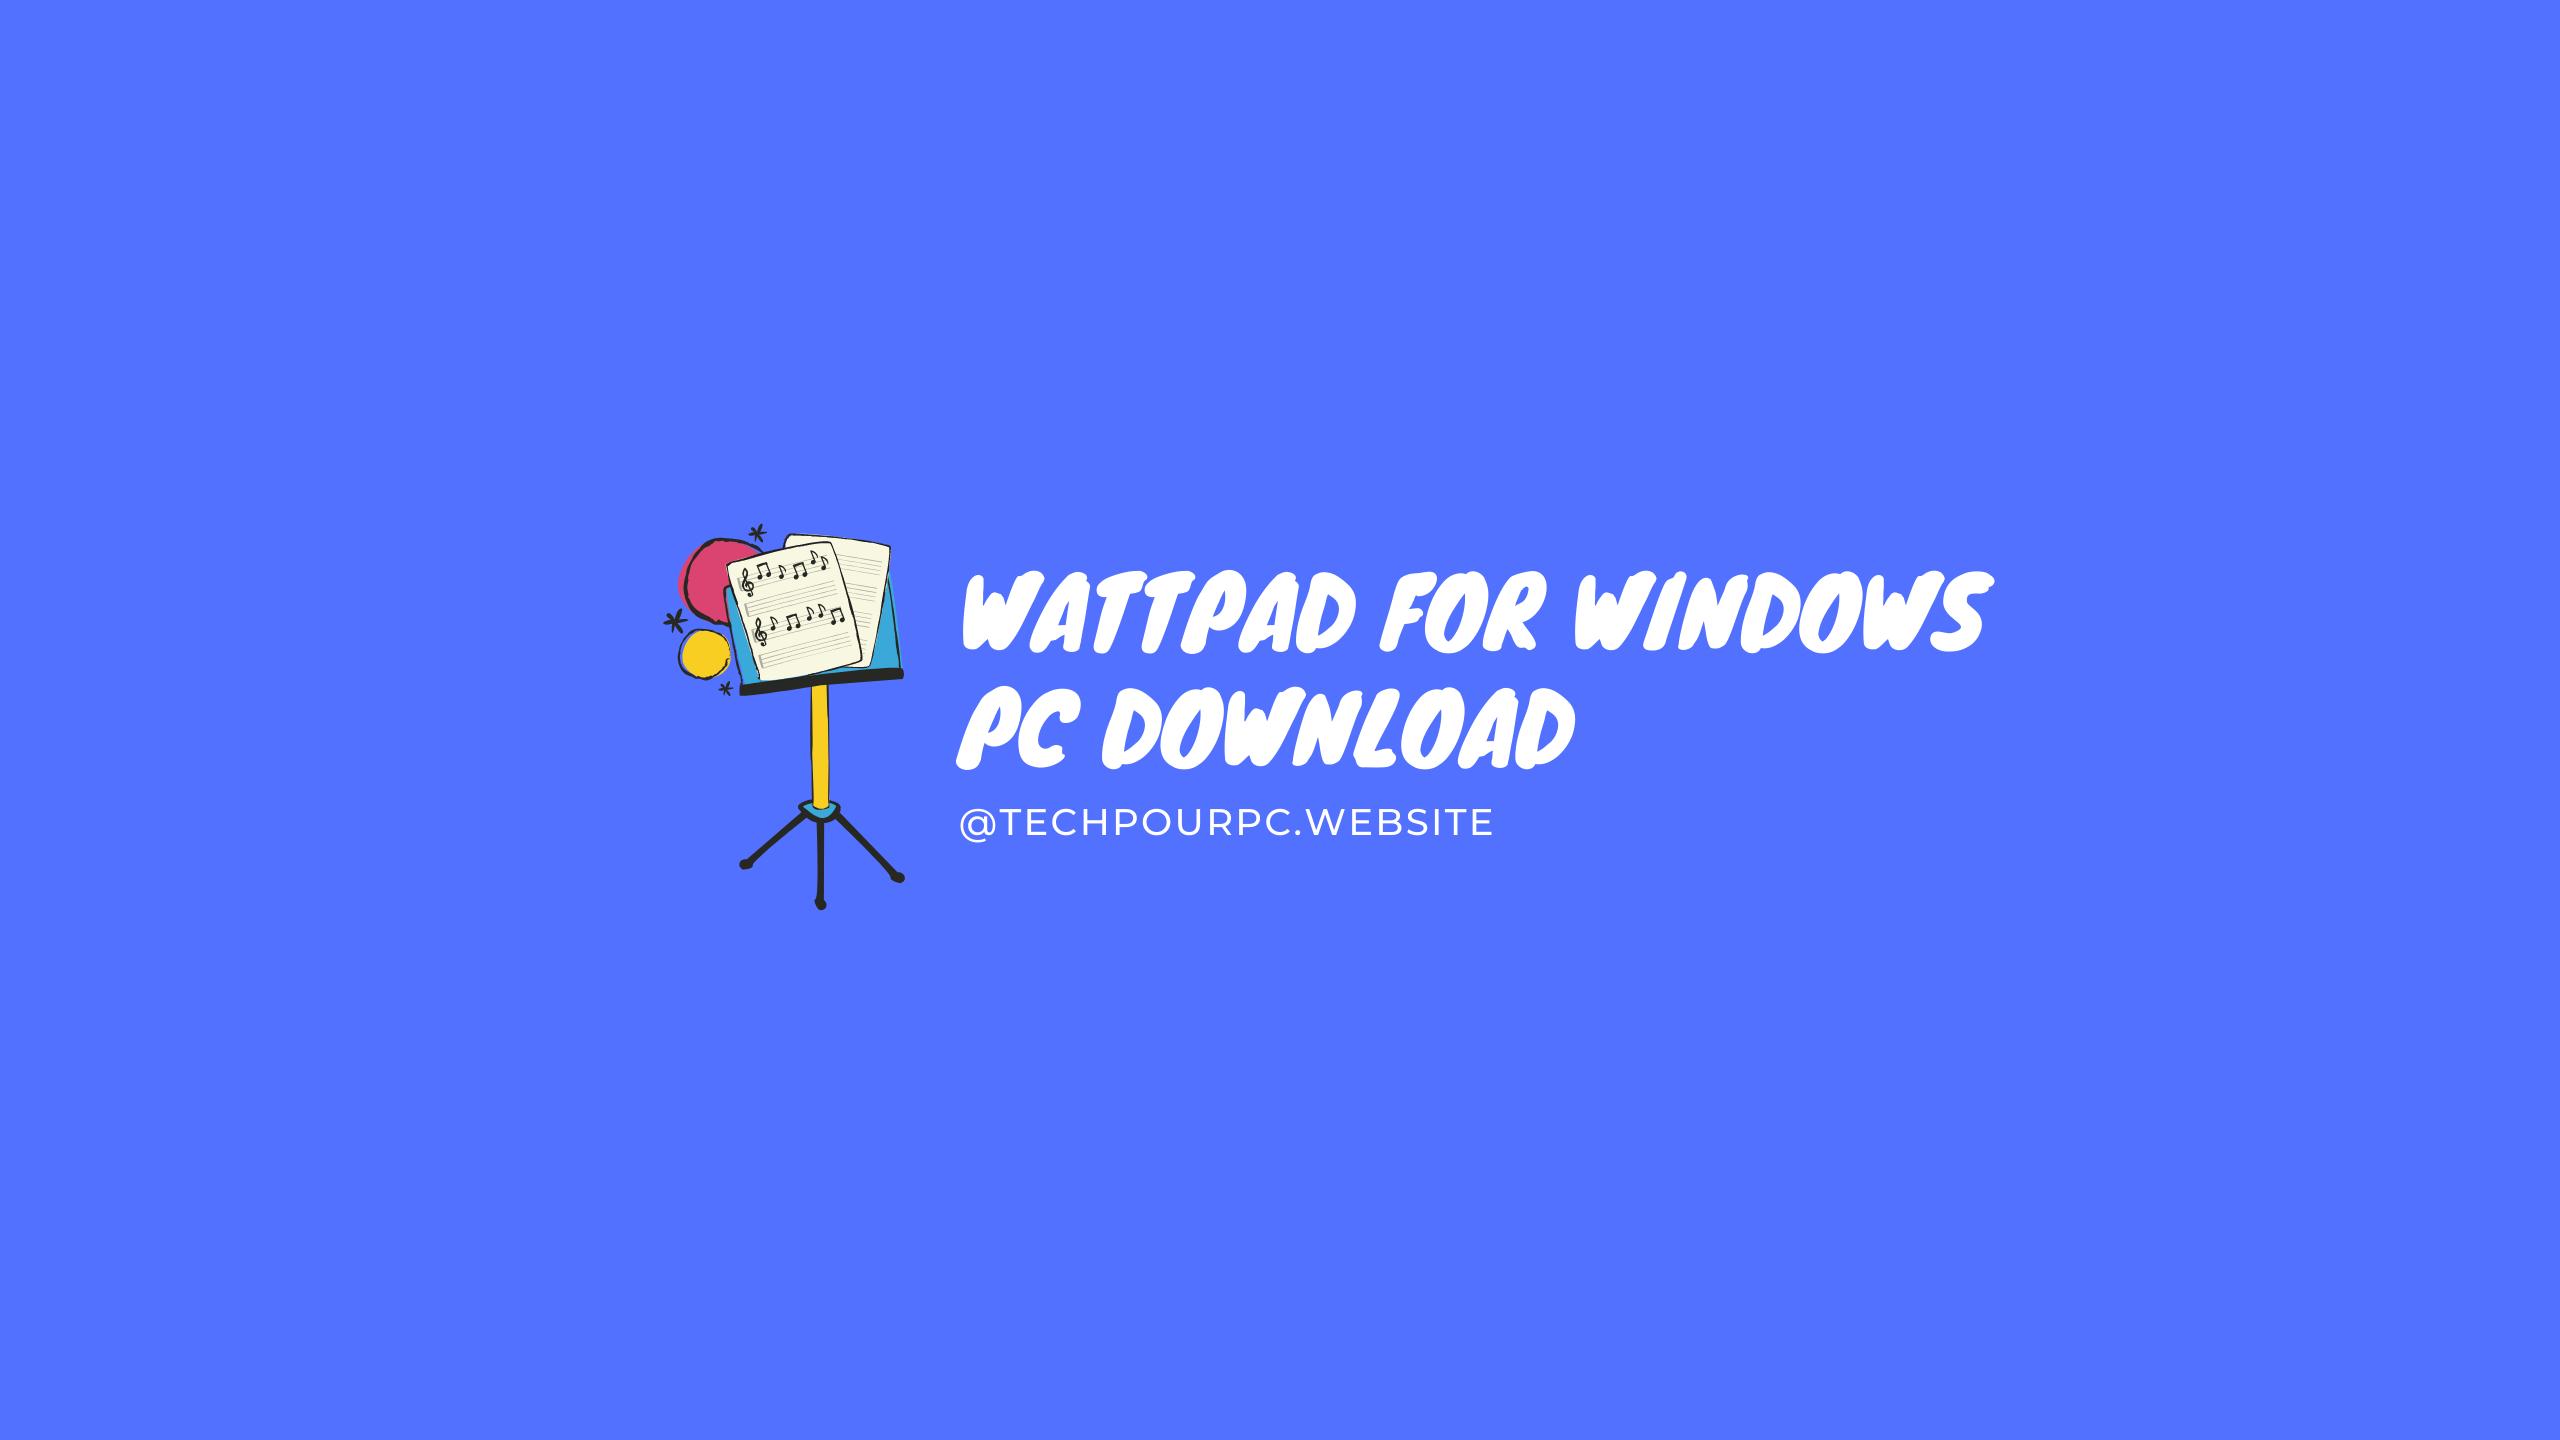 wattpad for Windows PC download